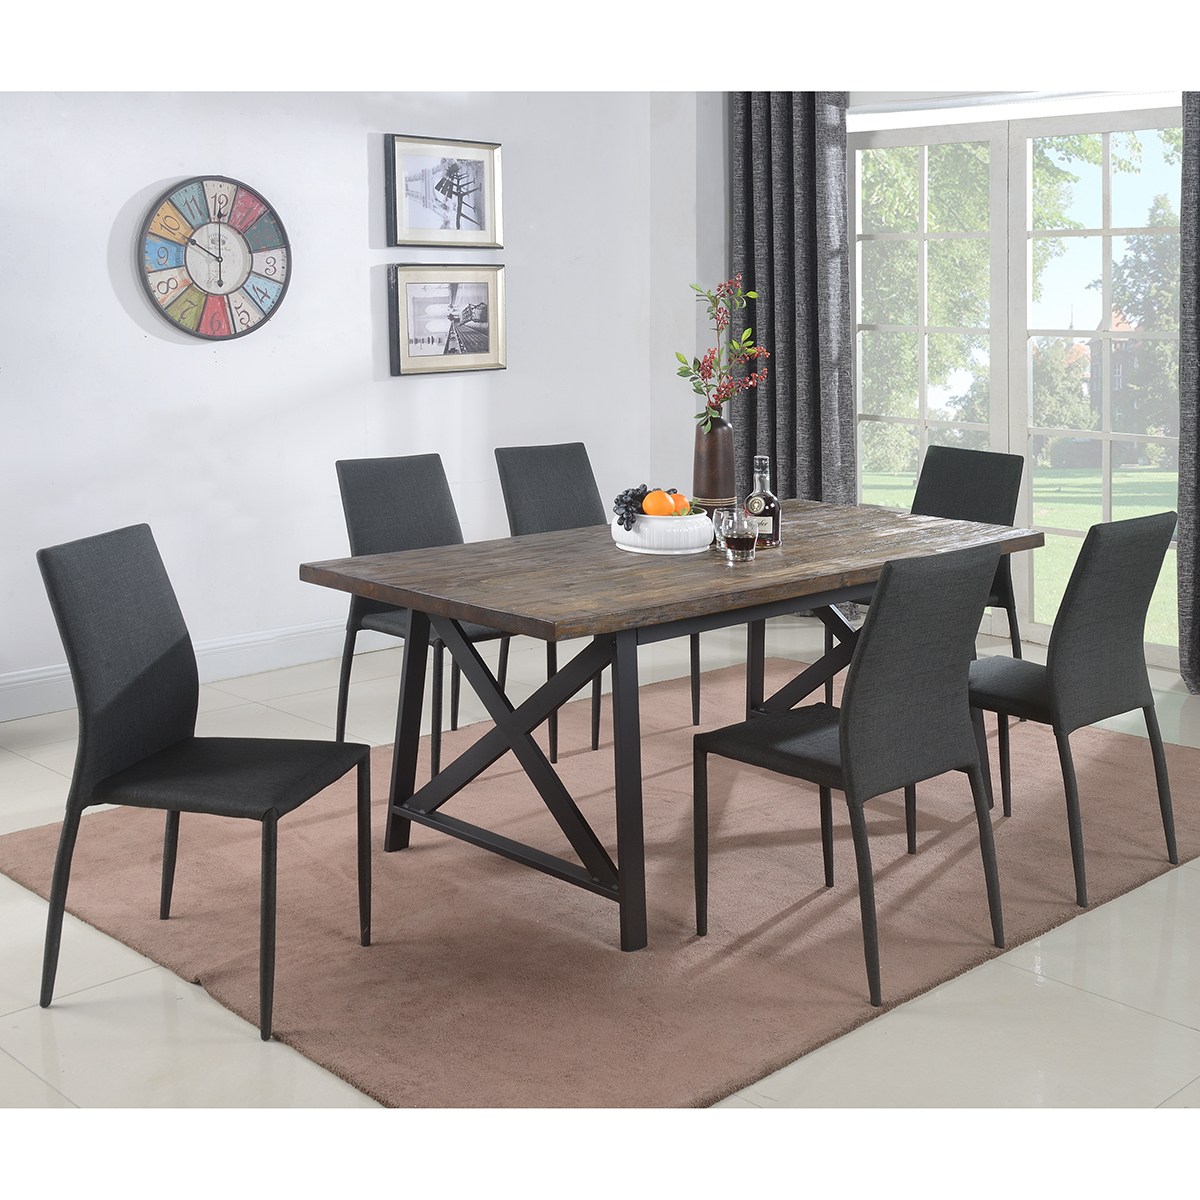 1683D Rustic table set 1